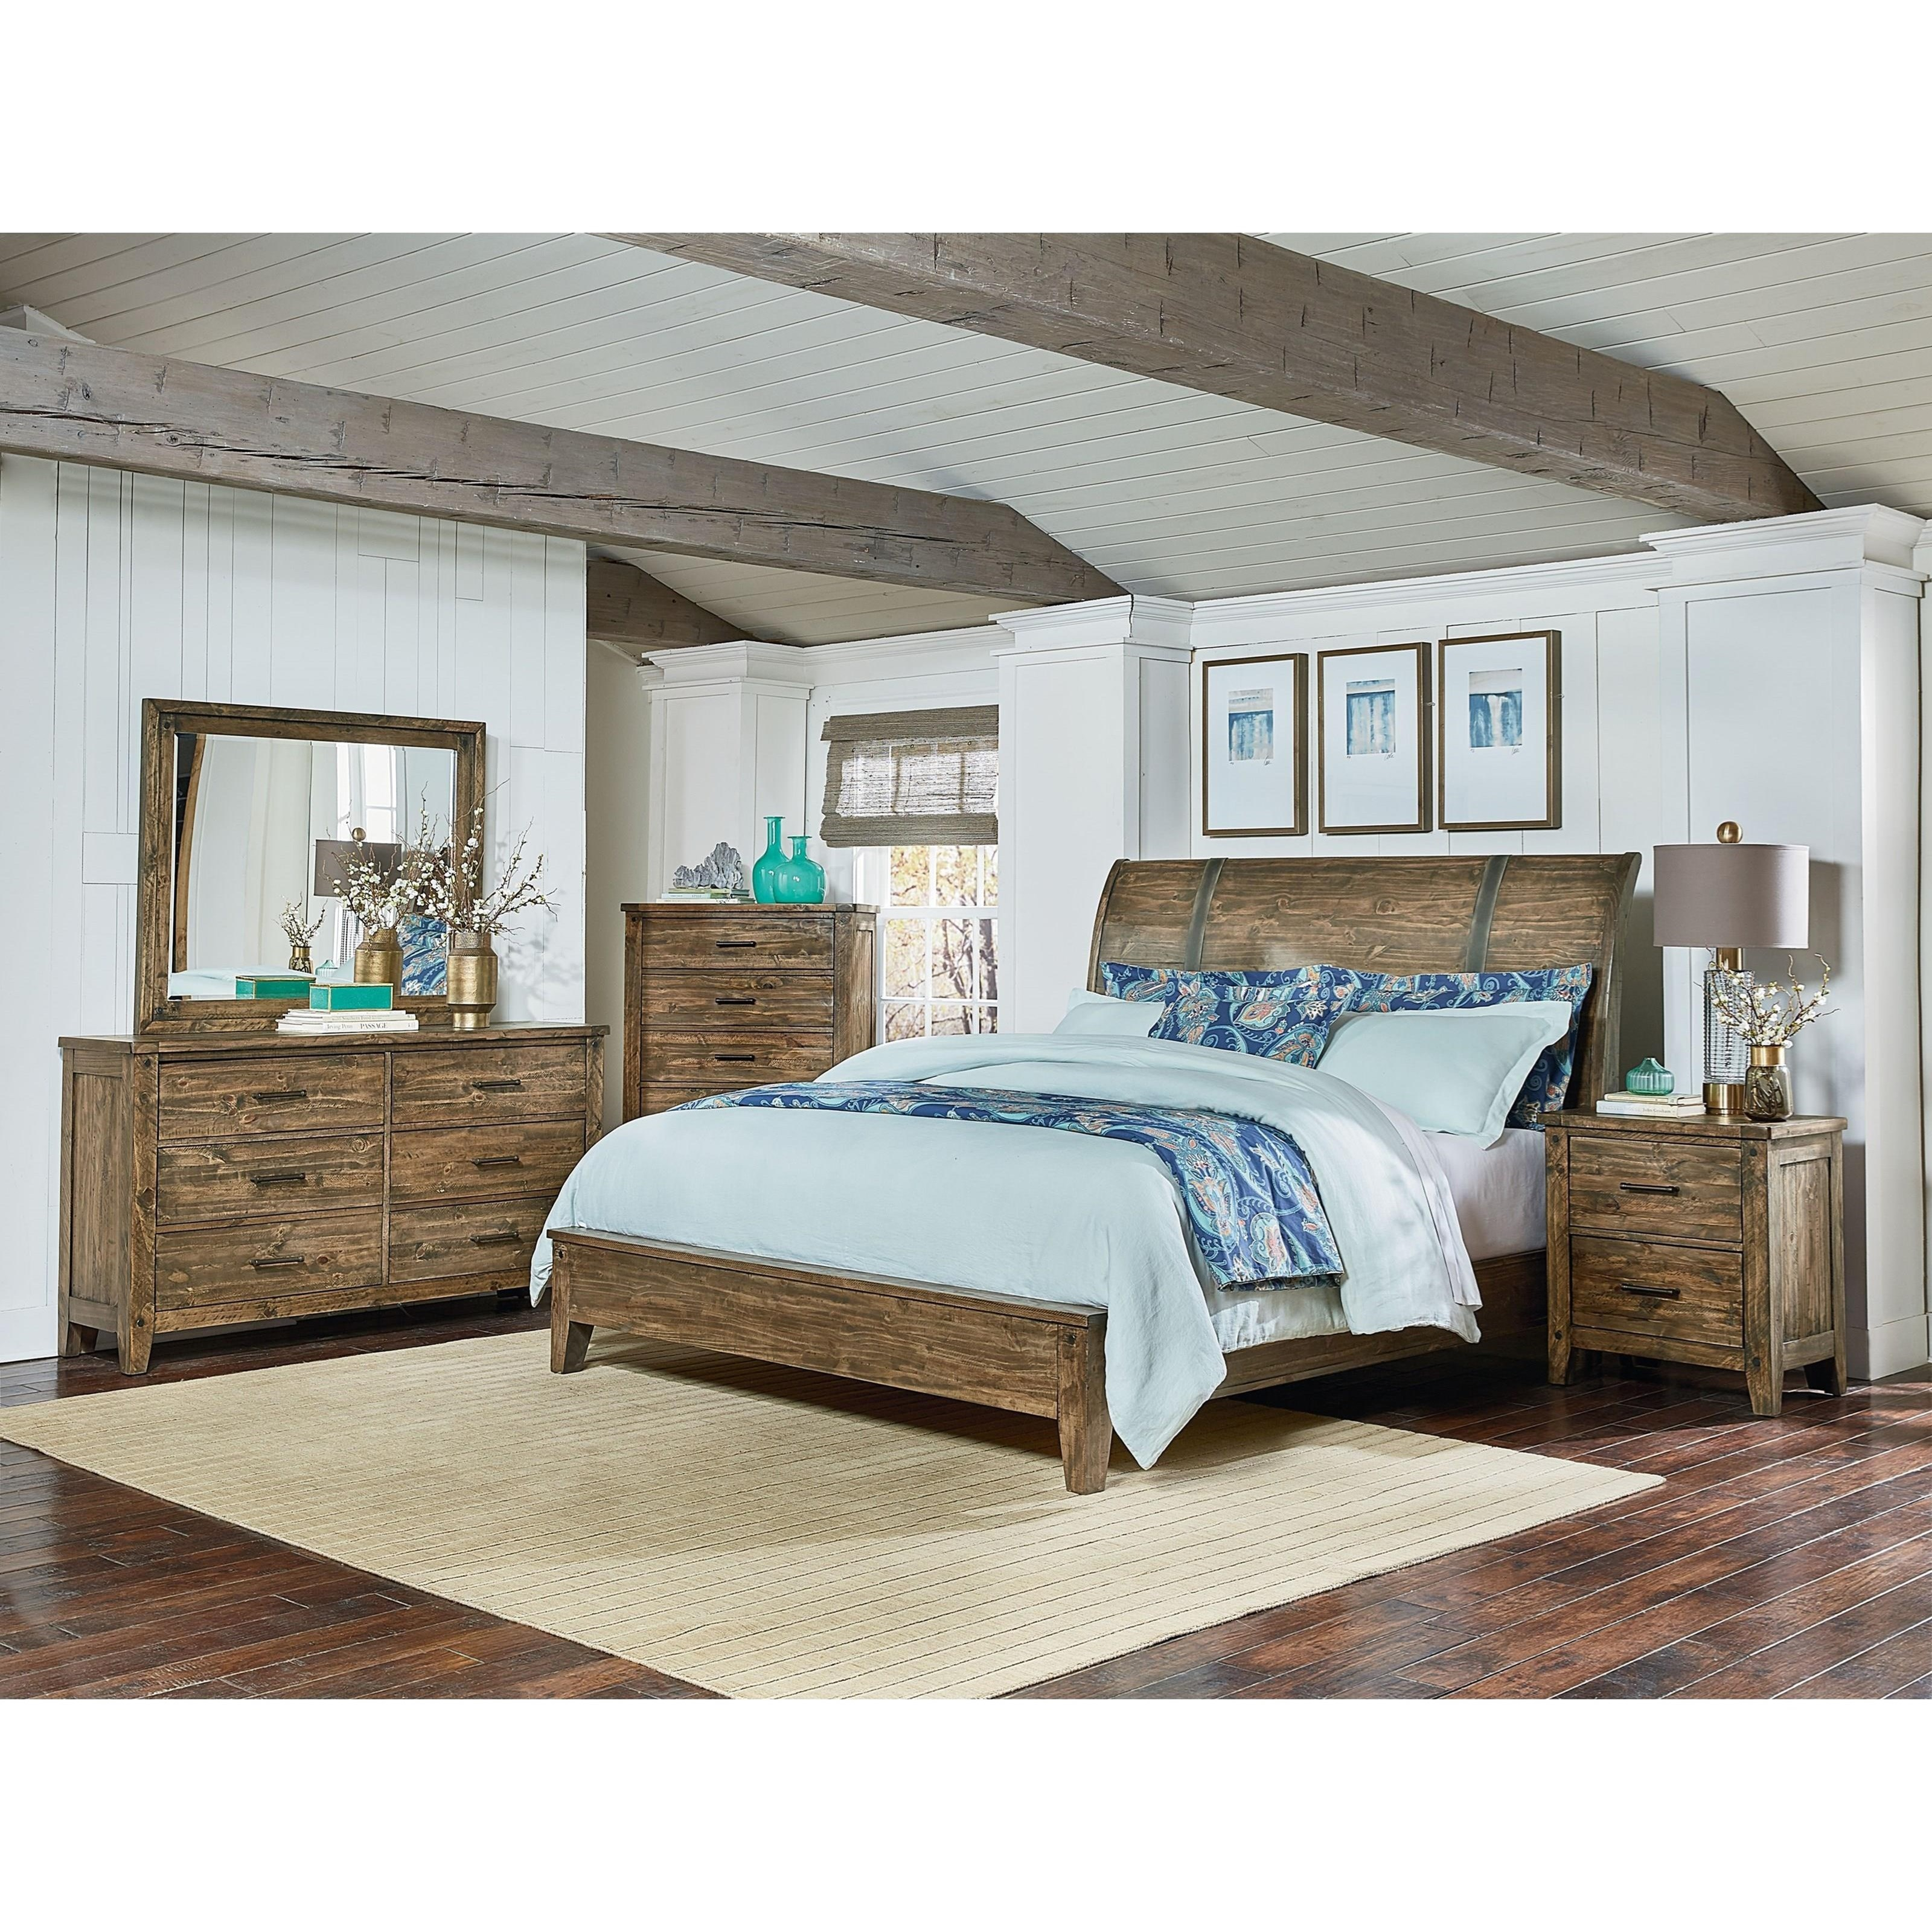 Great Furniture Stores: Standard Furniture Nelson 92509 Rustic Six Drawer Dresser